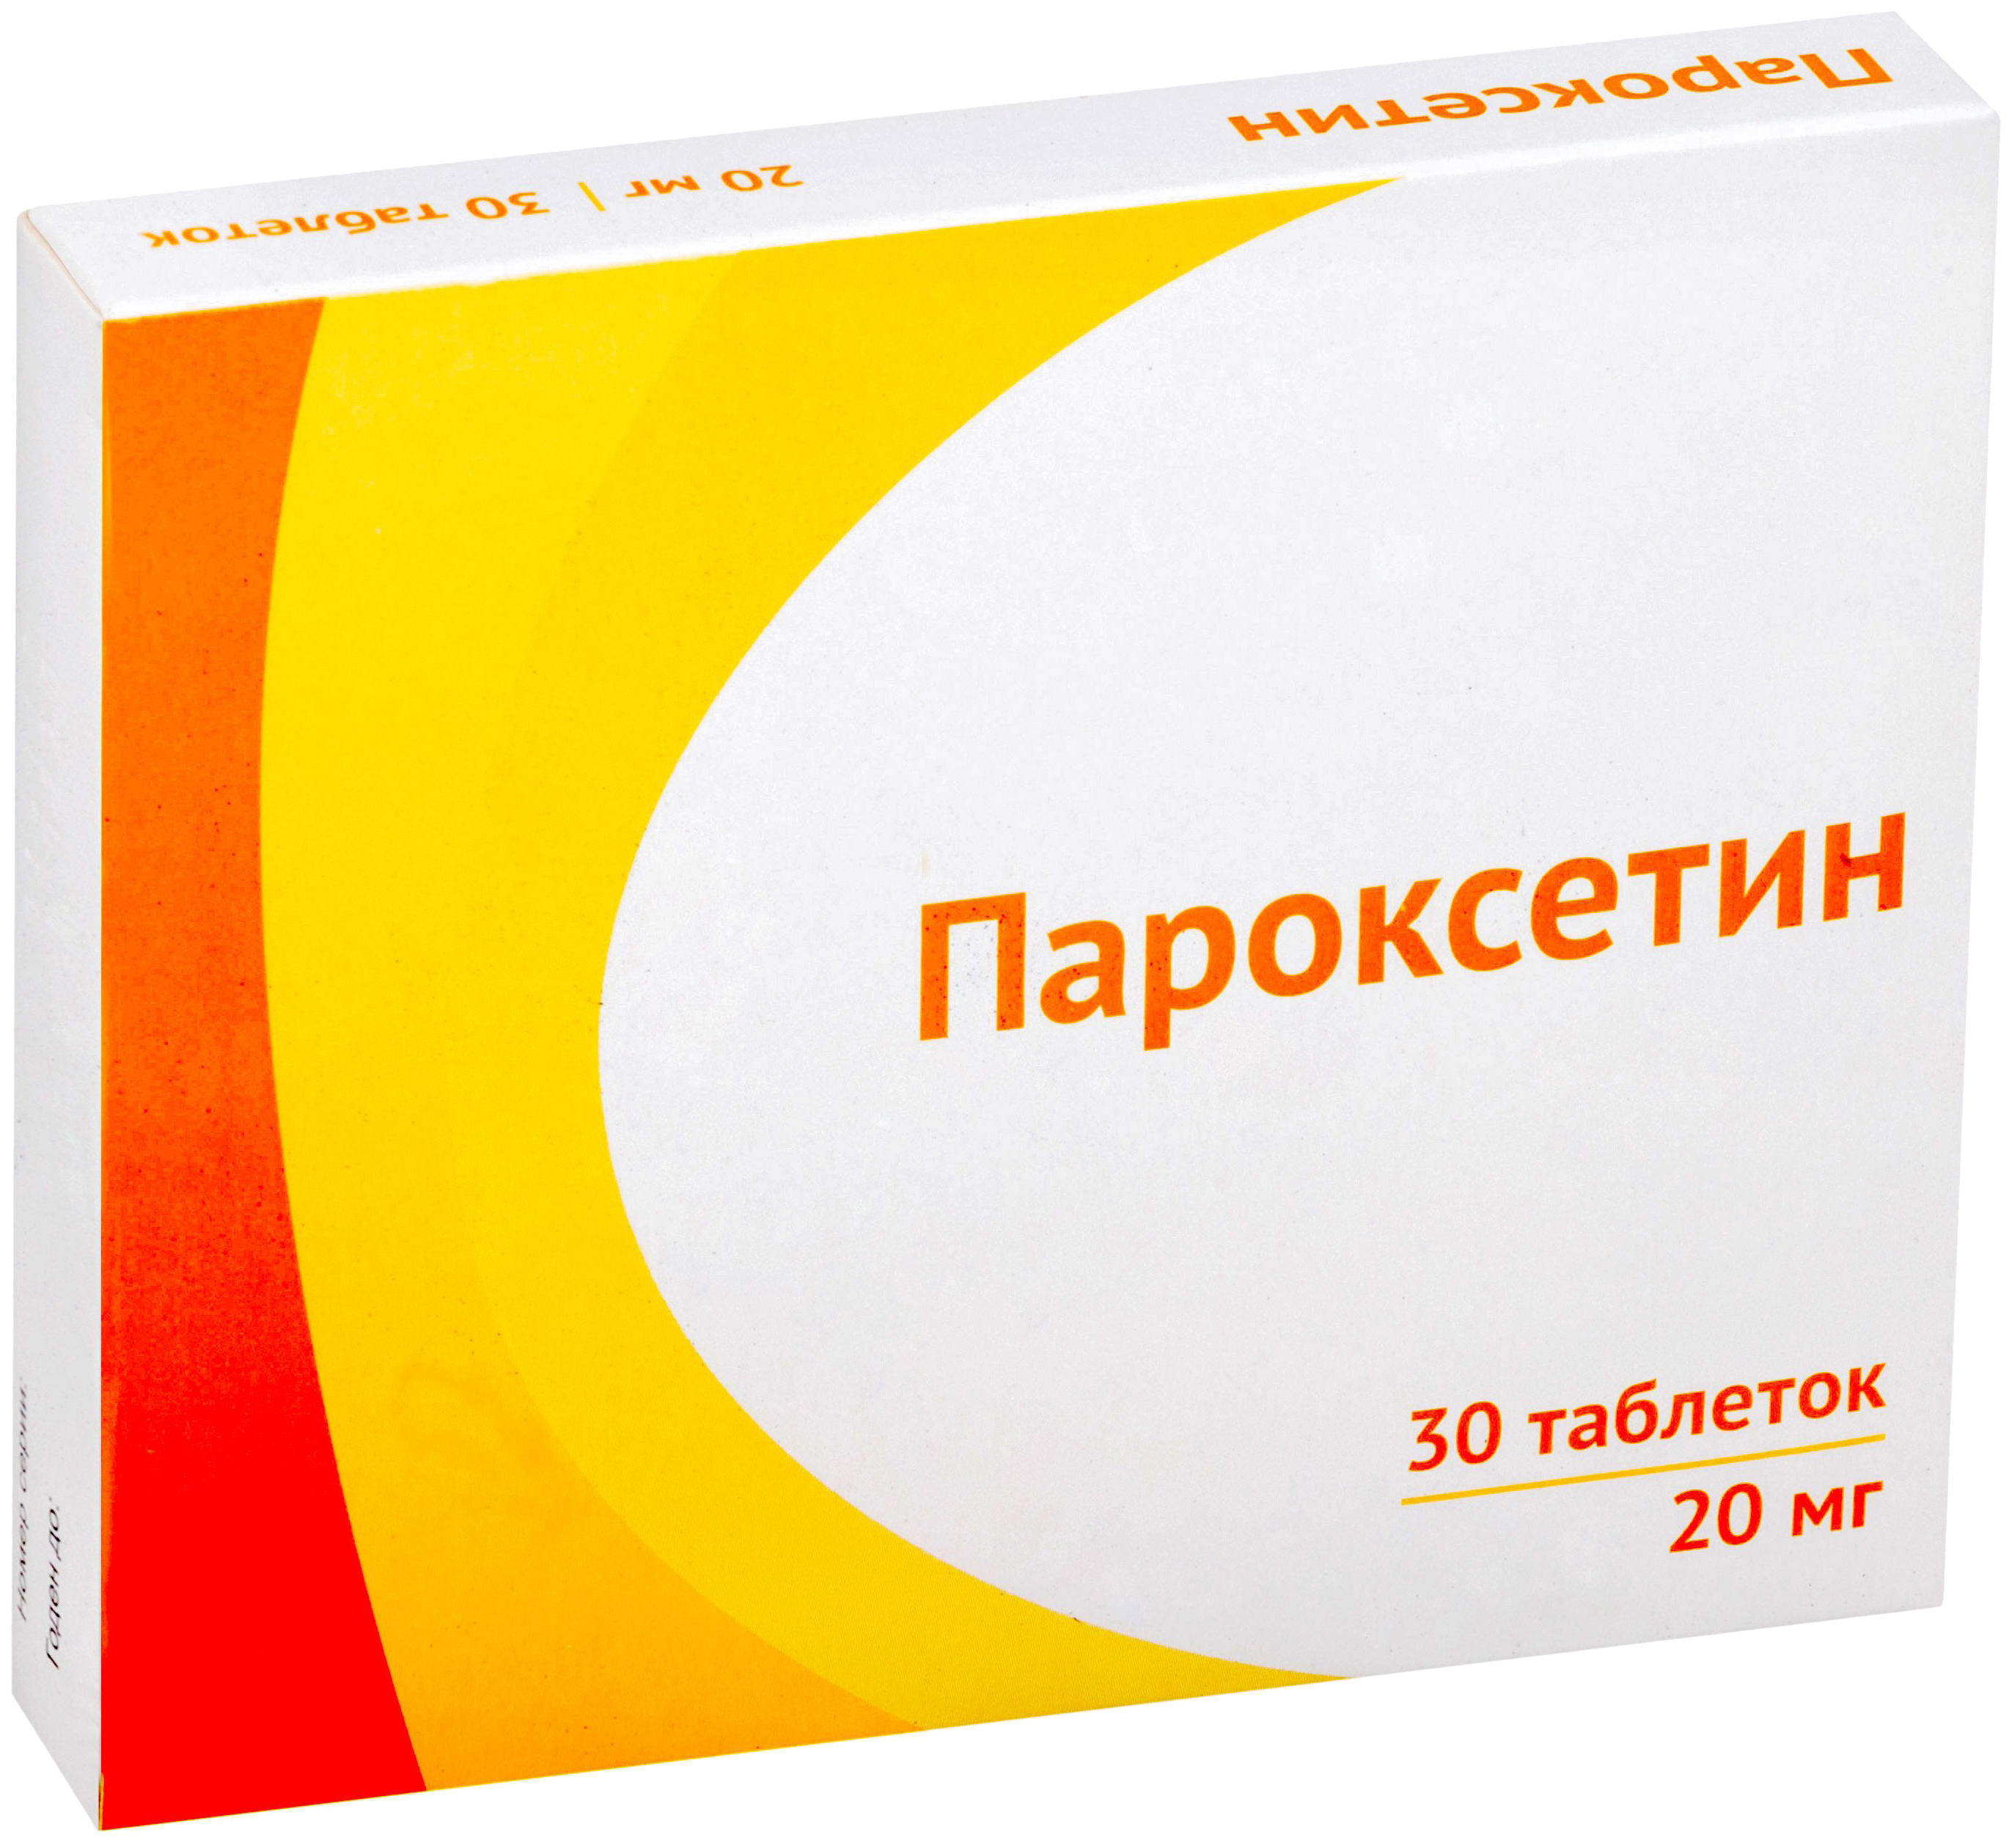 ПАРОКСЕТИН таблетки 20 мг 30 шт.